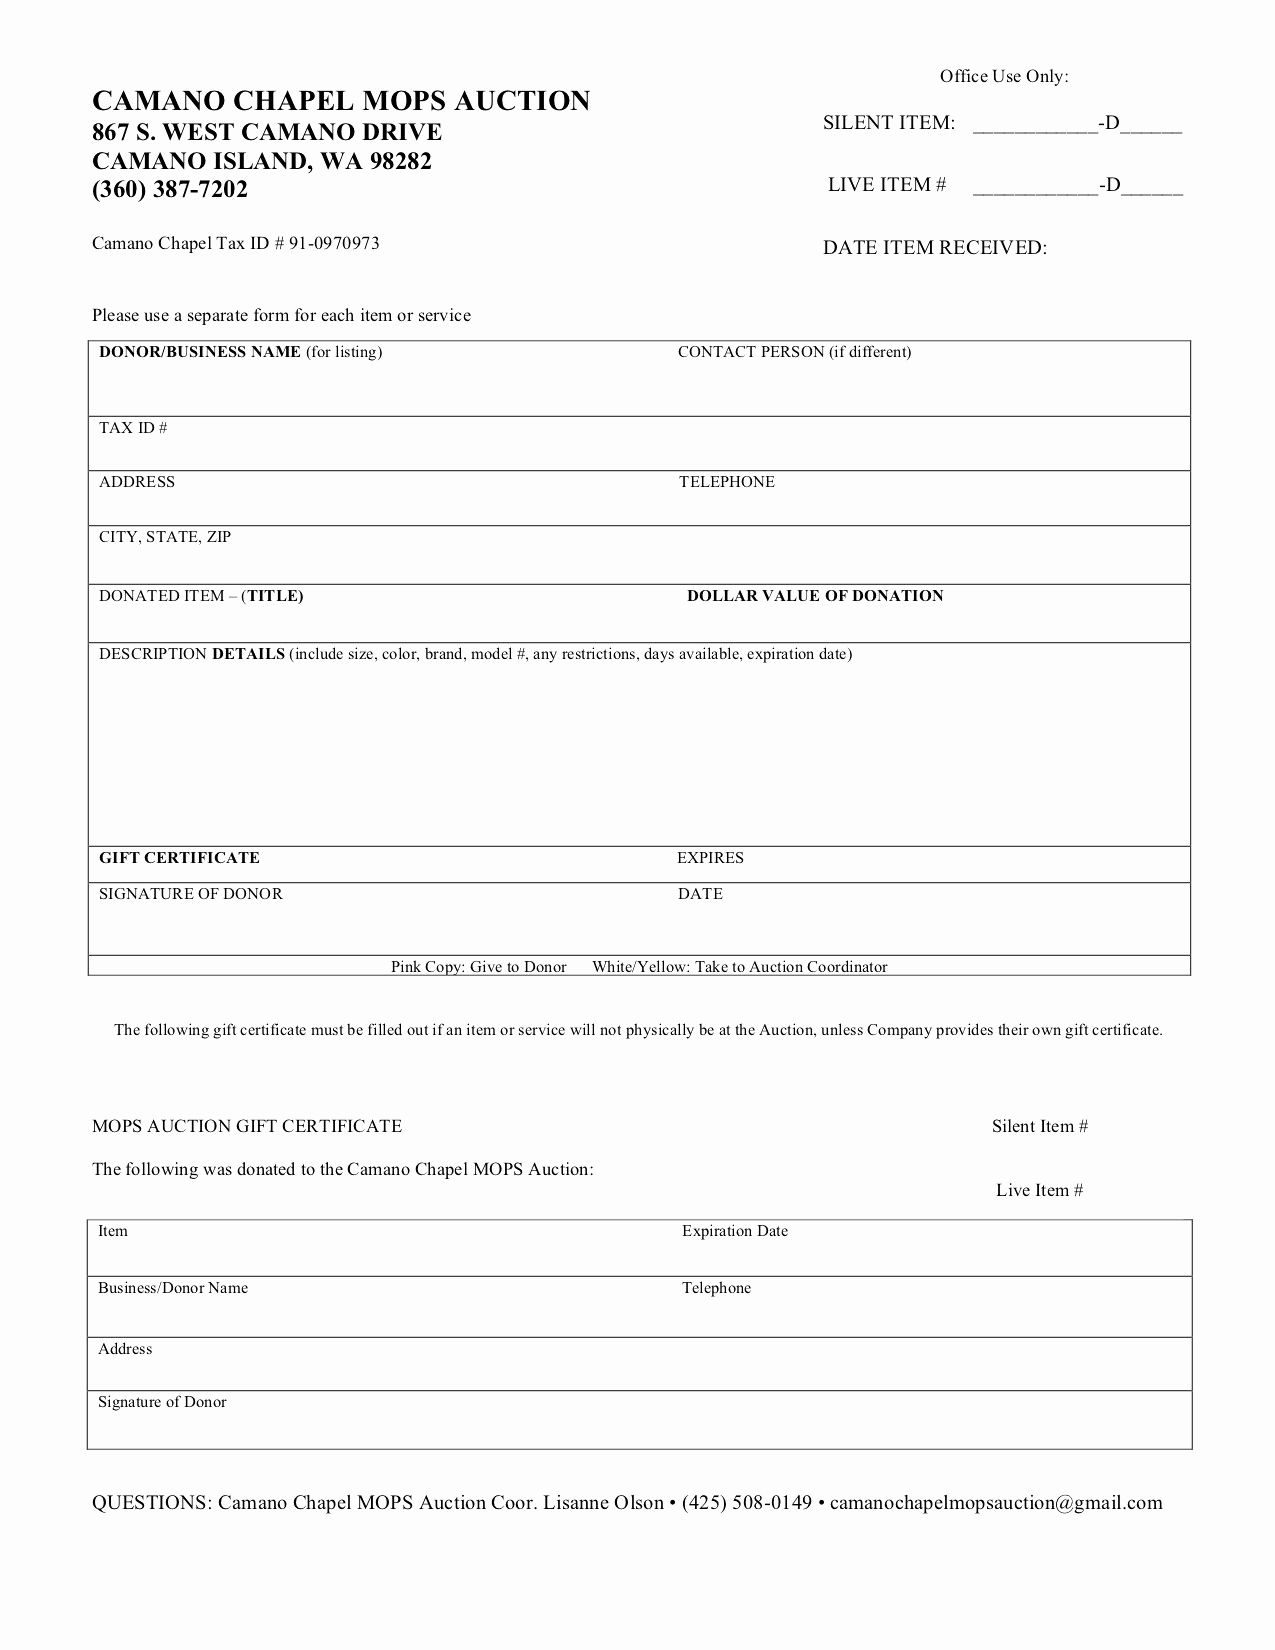 Salvation Army Donation Spreadsheet